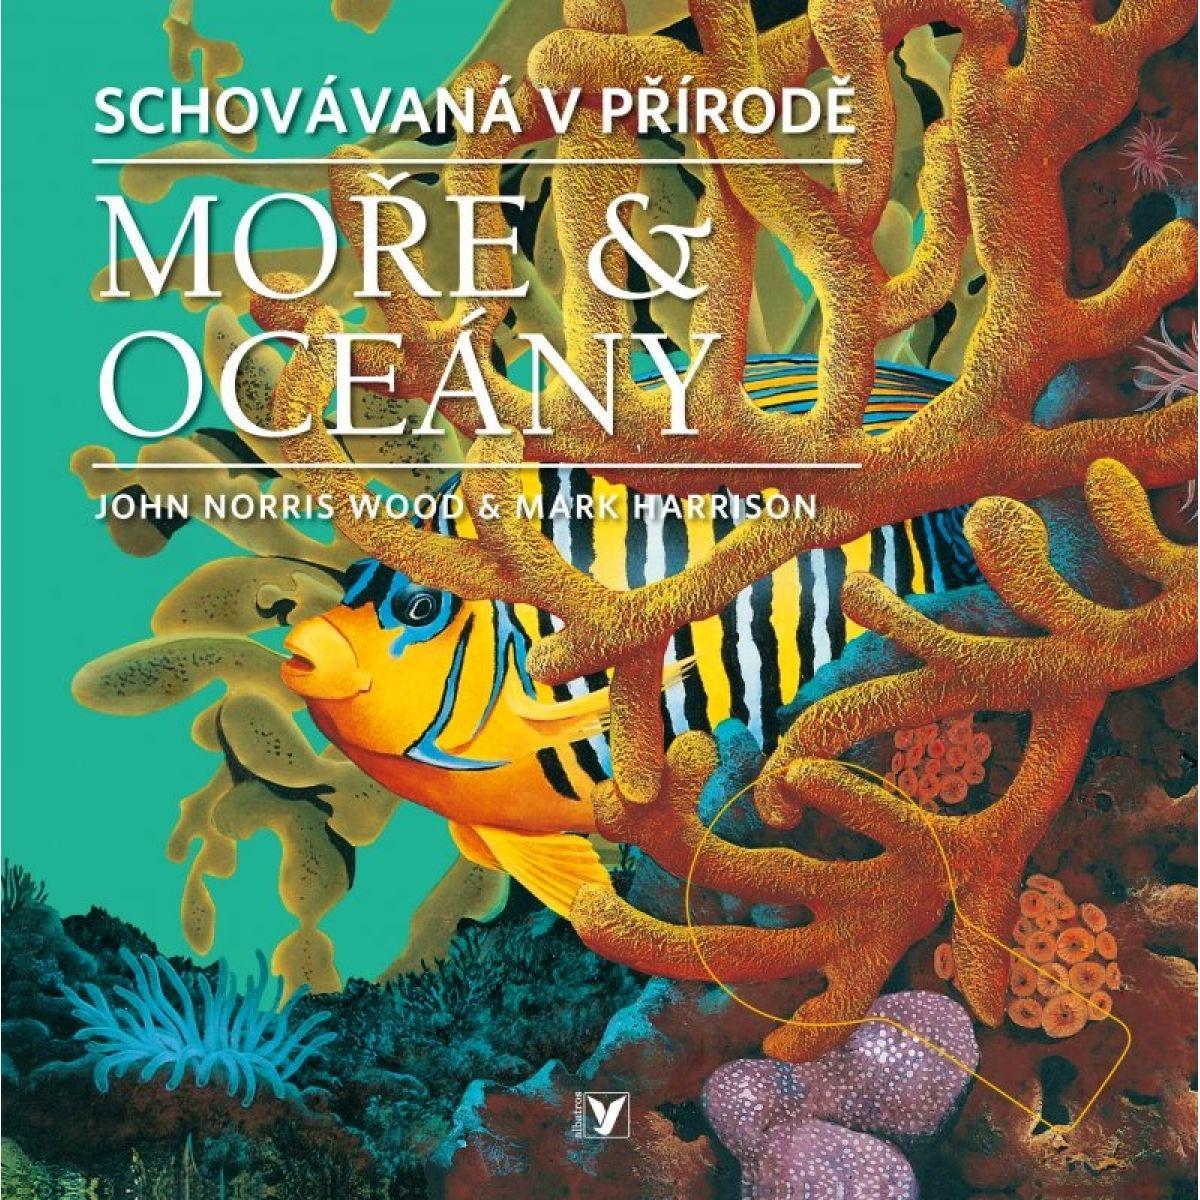 Moře & oceány - John Norris Wood, Mark Harrison (Albatros 1011027051)